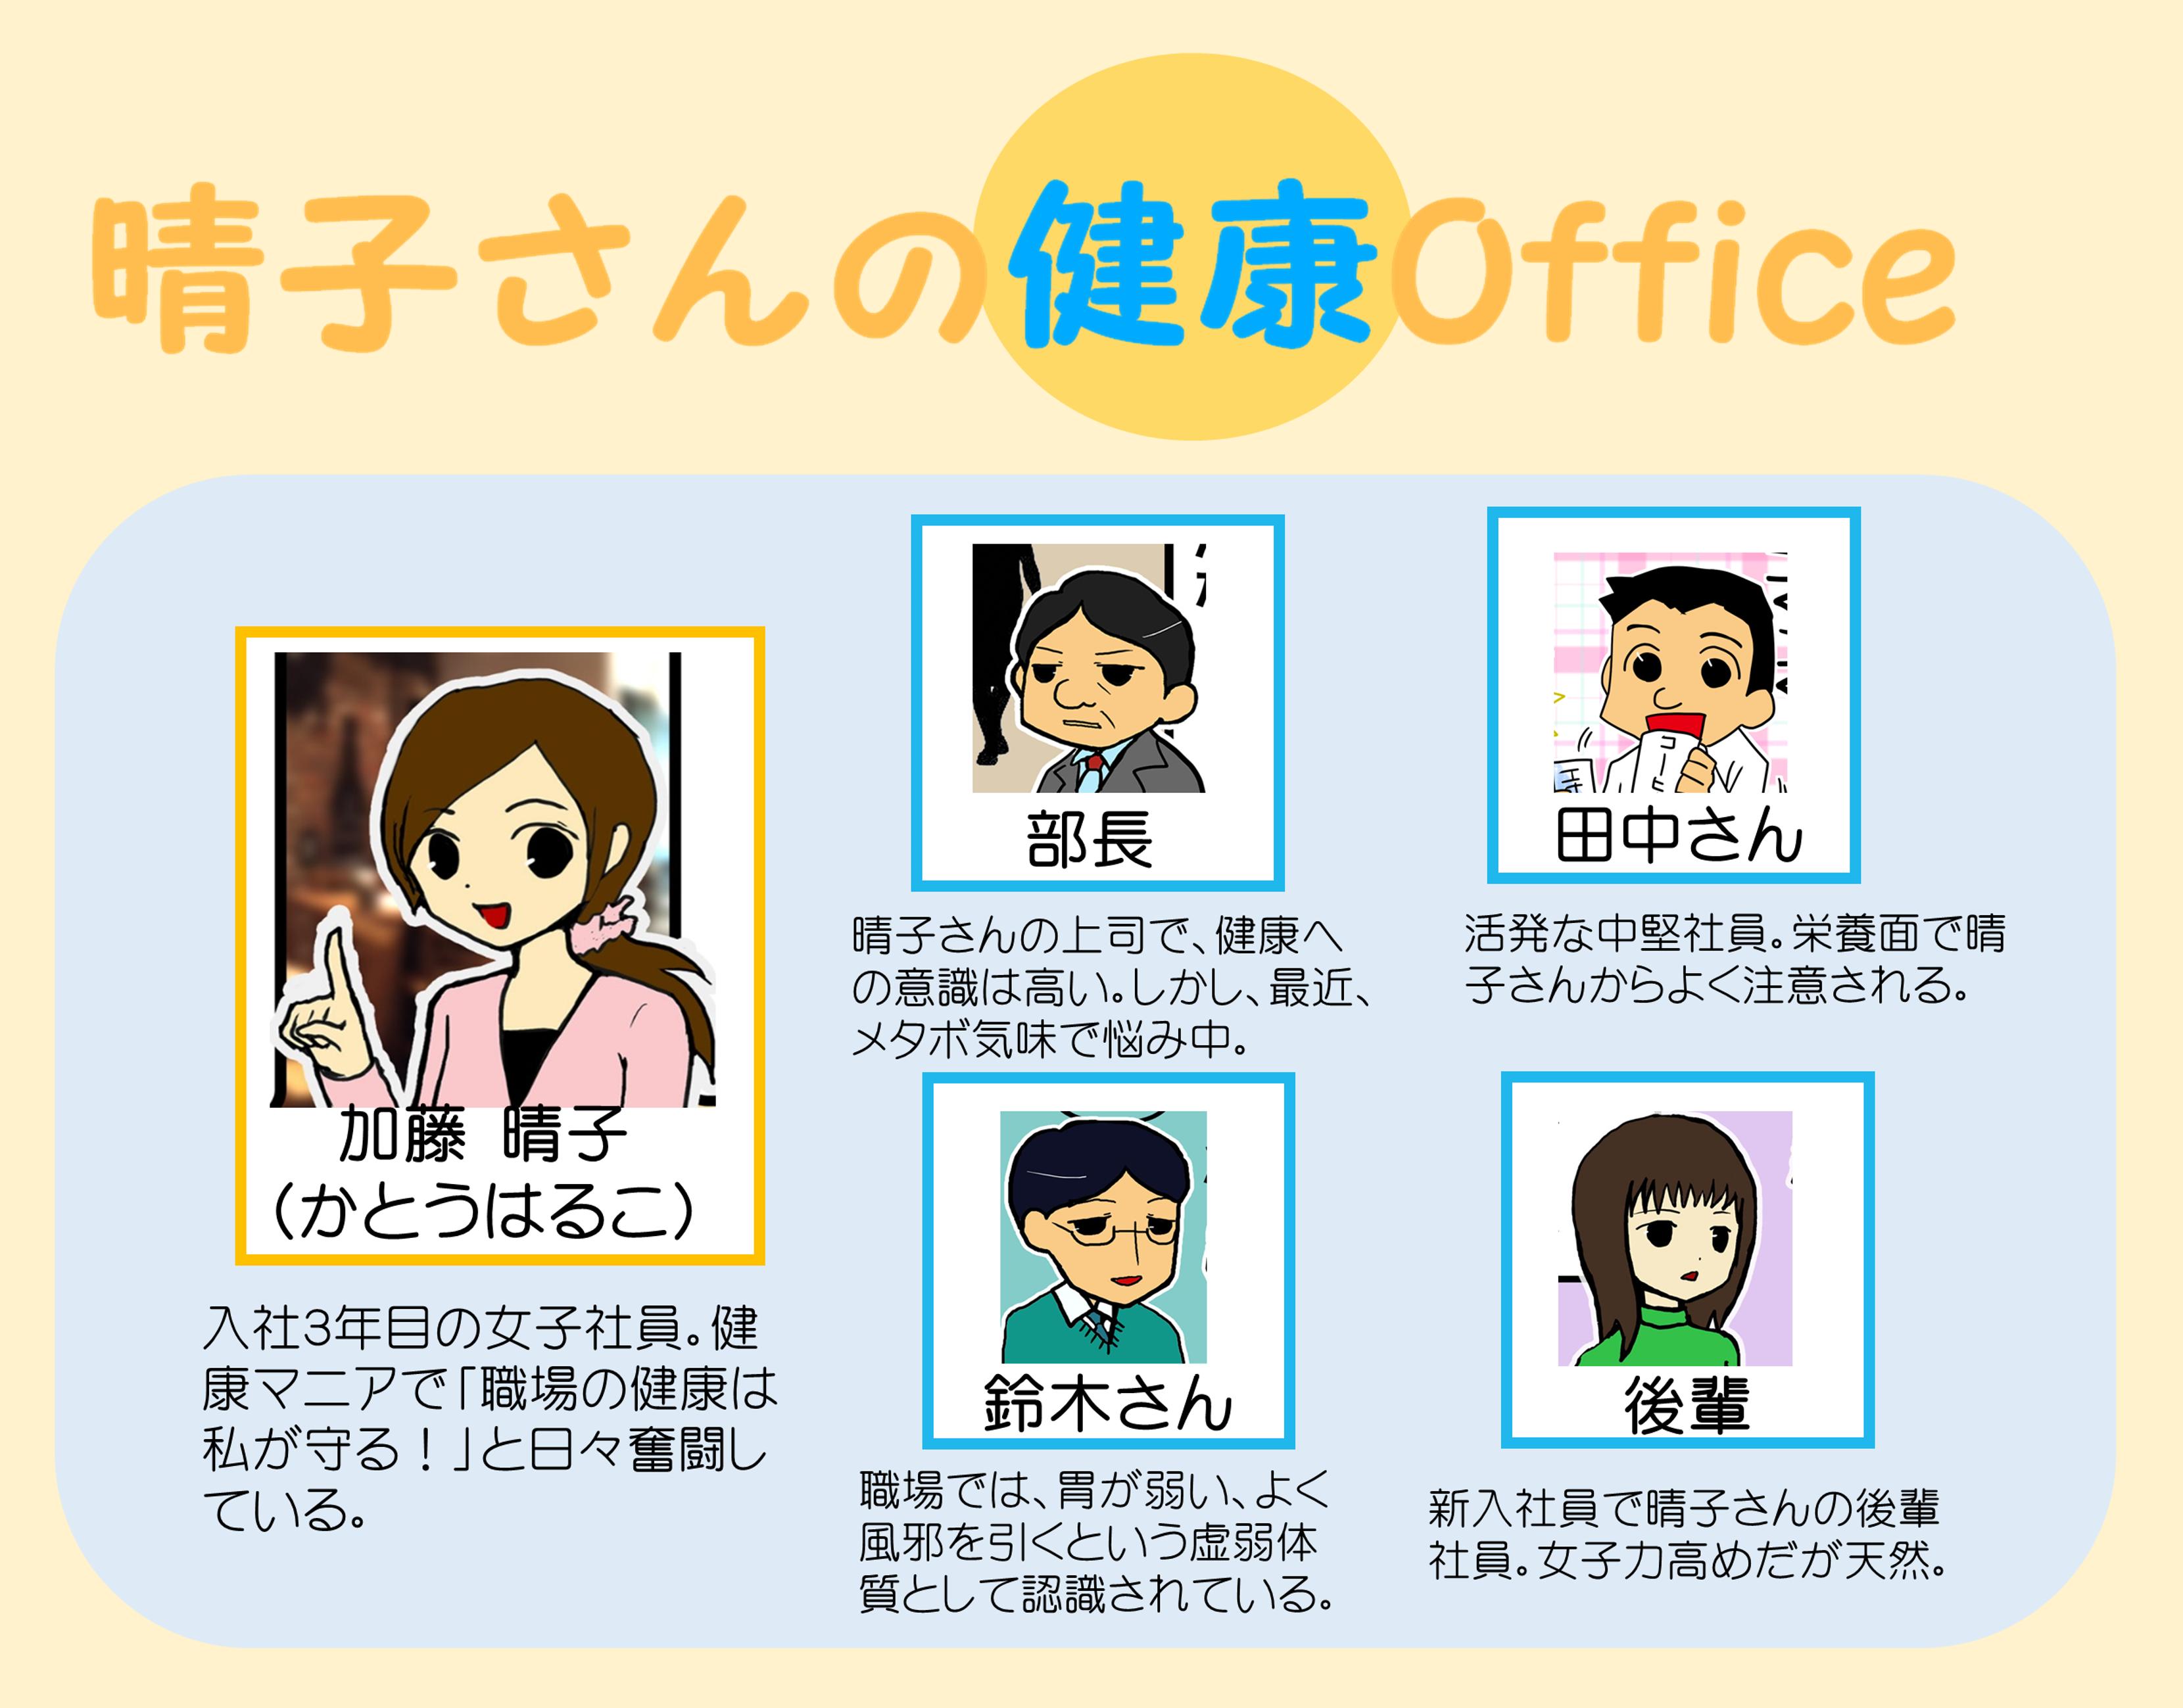 No.1  4コマ漫画で健康ニュースを伝える工夫 「晴子さんの健康オフィス」